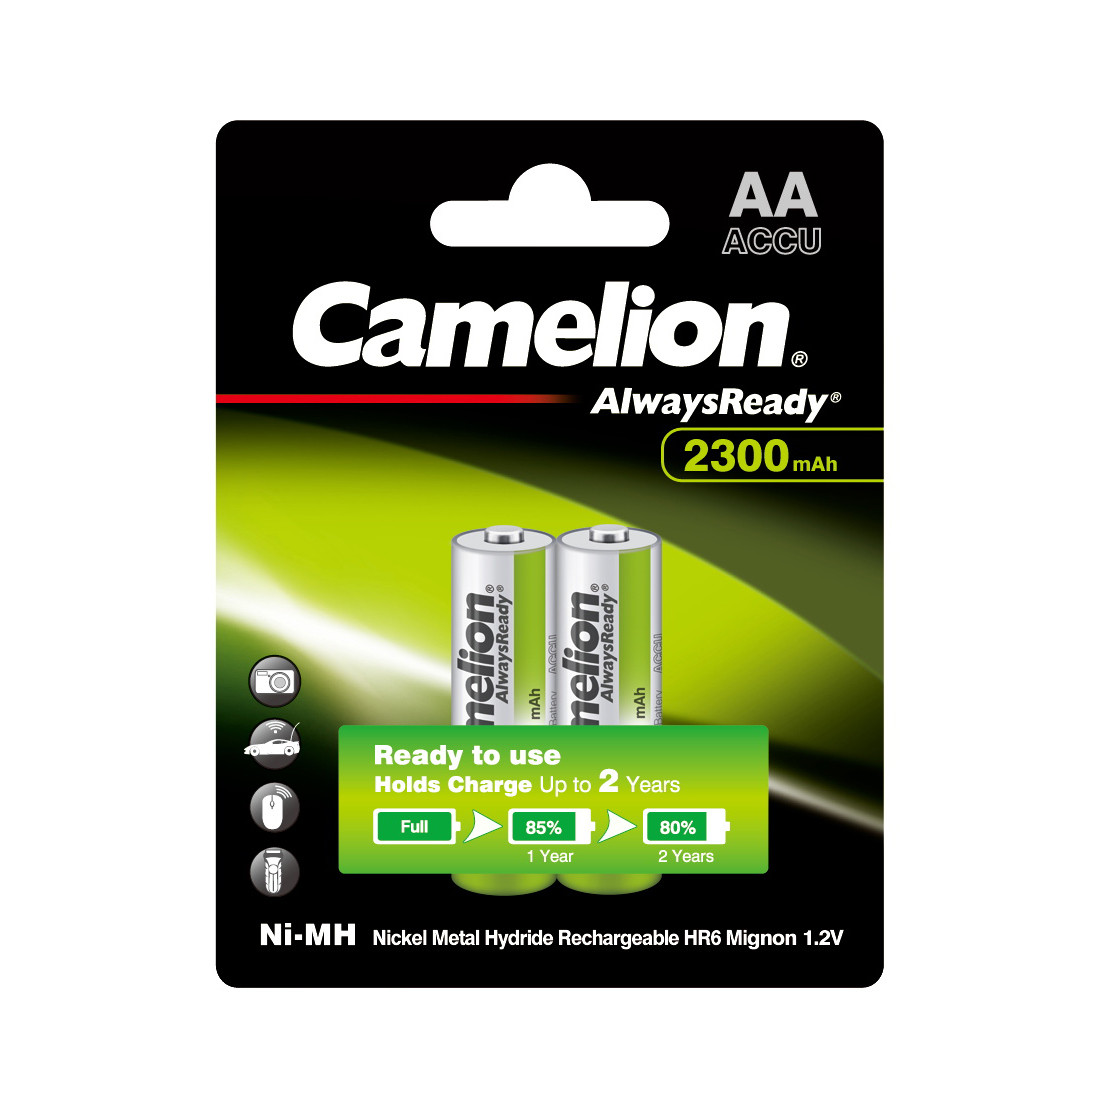 CAMELION, AlwaysReady Rechargeable, Ni-MH, NH-AA2300ARBP2, 2300 мА/ч, (2 шт.), аккумулятор